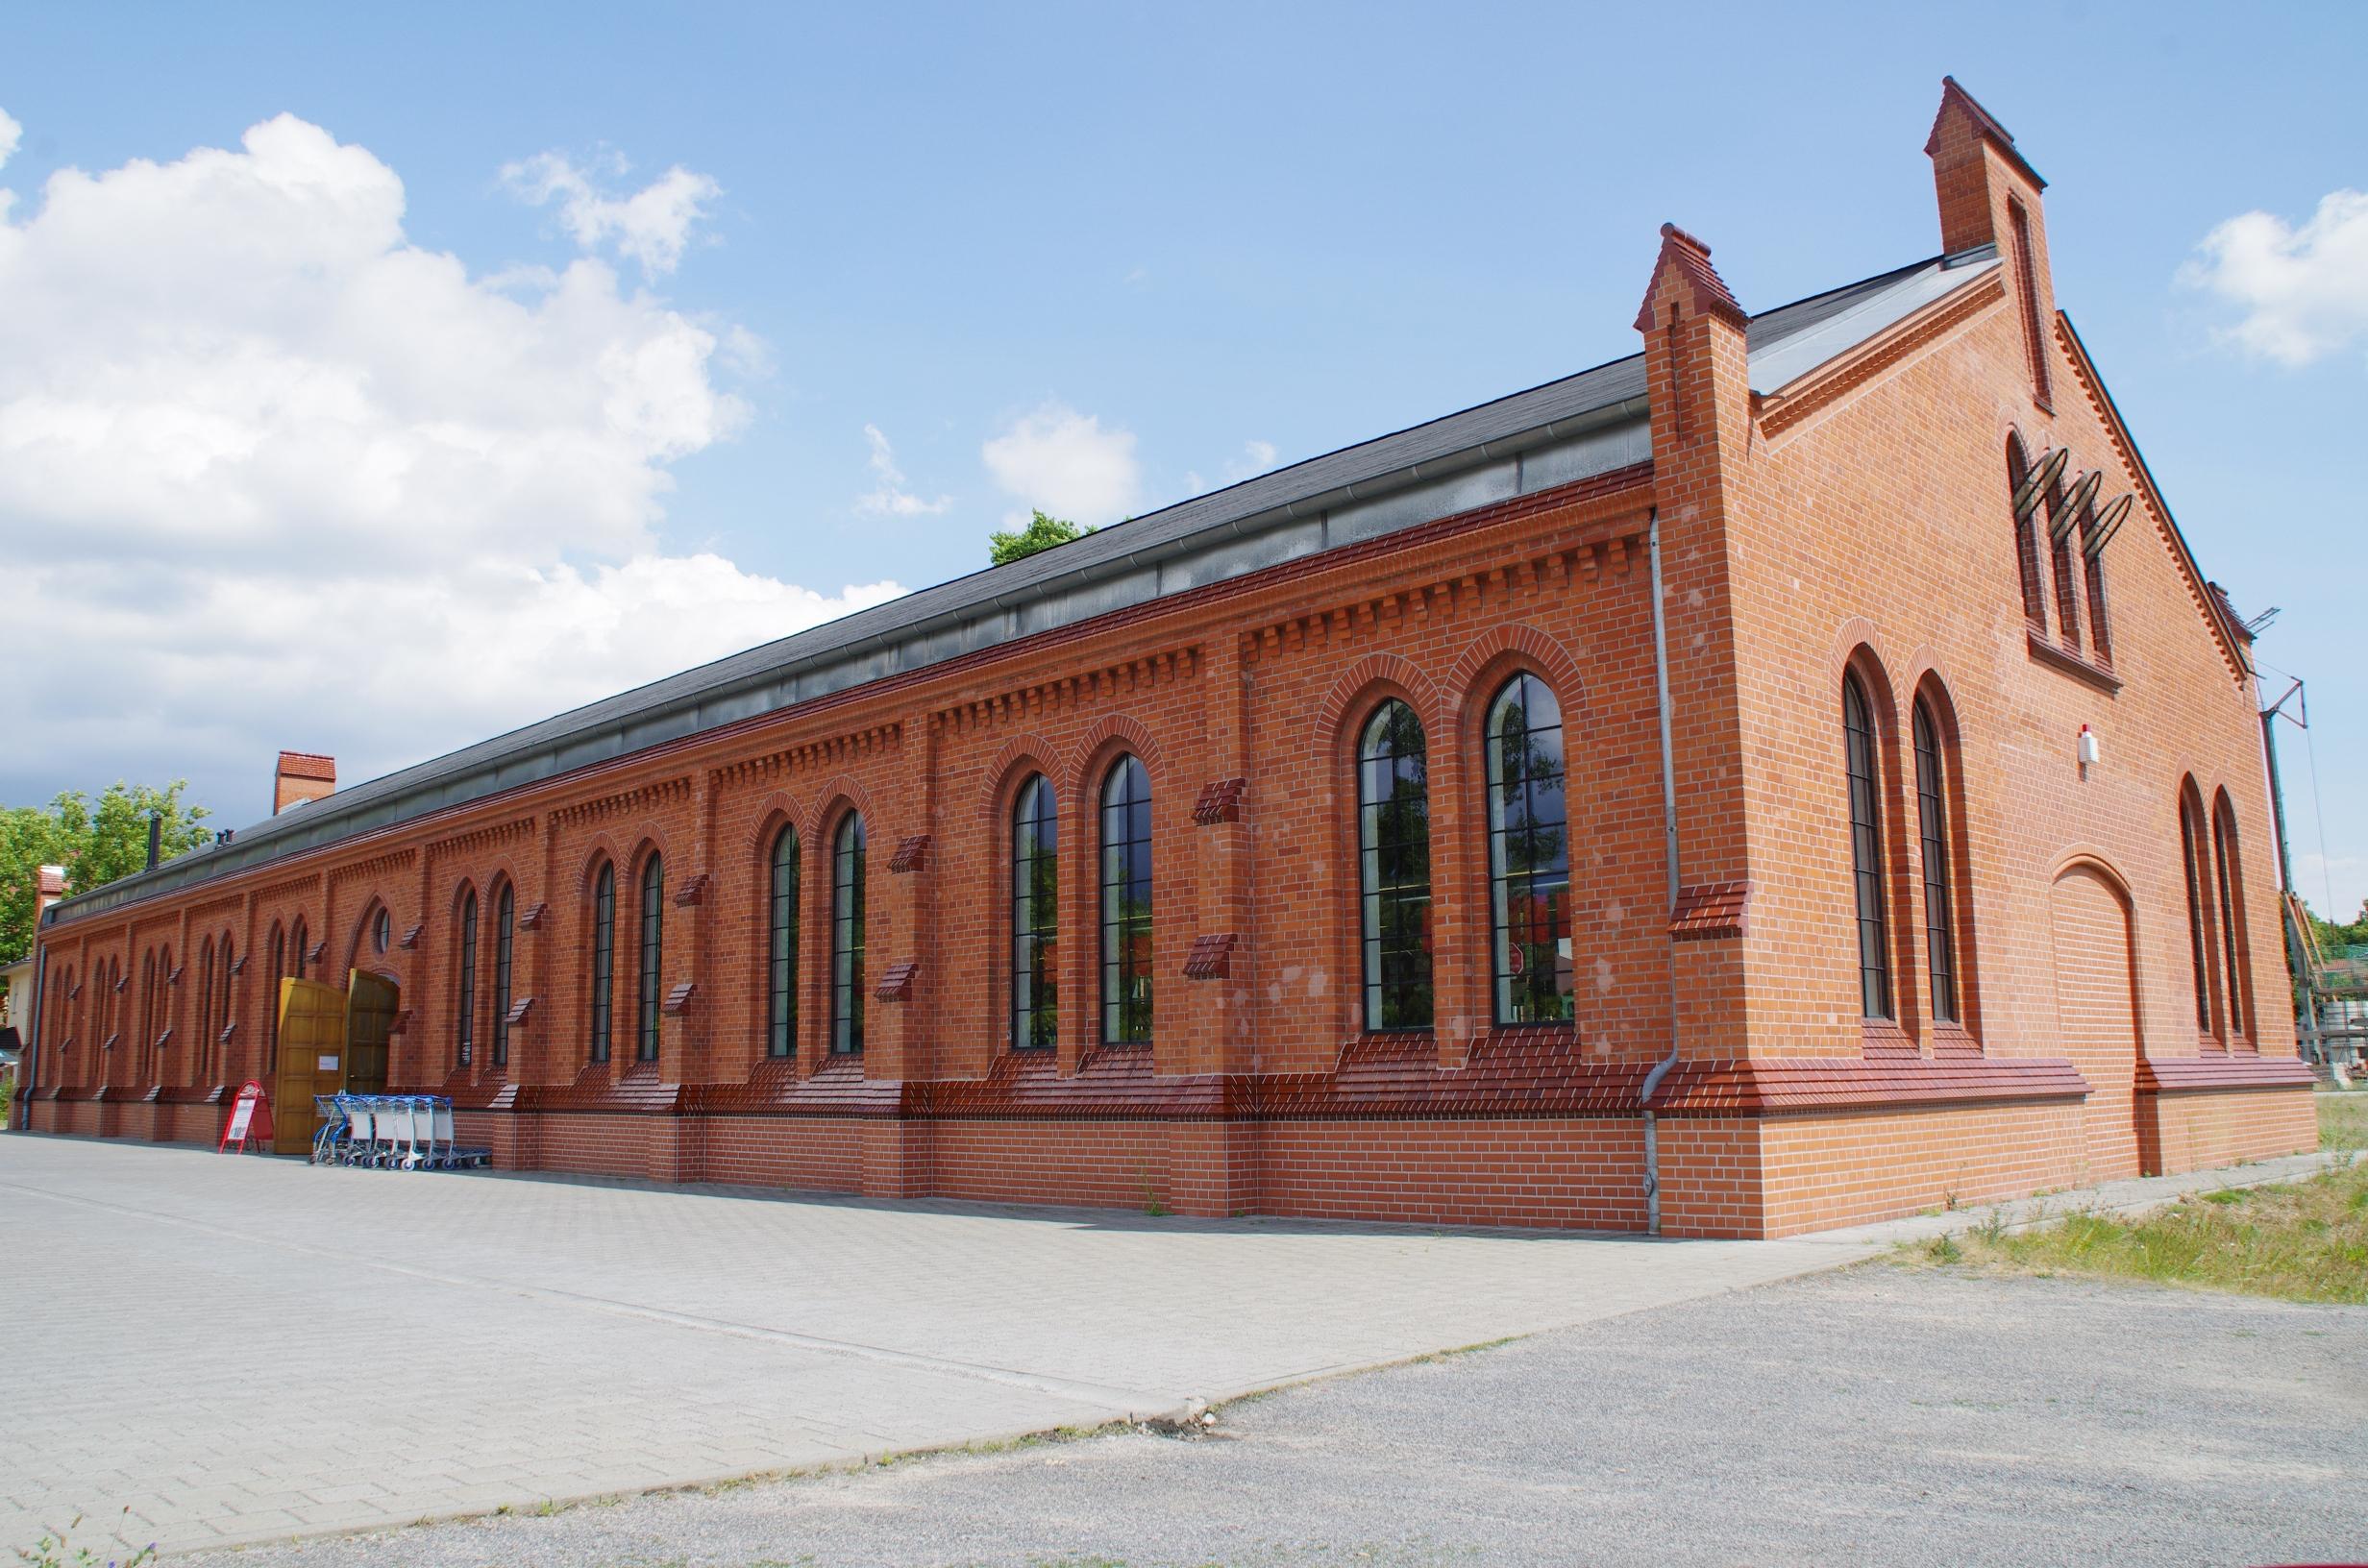 File:An der Exerzierhalle 1 Lübben.jpg - Wikimedia Commons